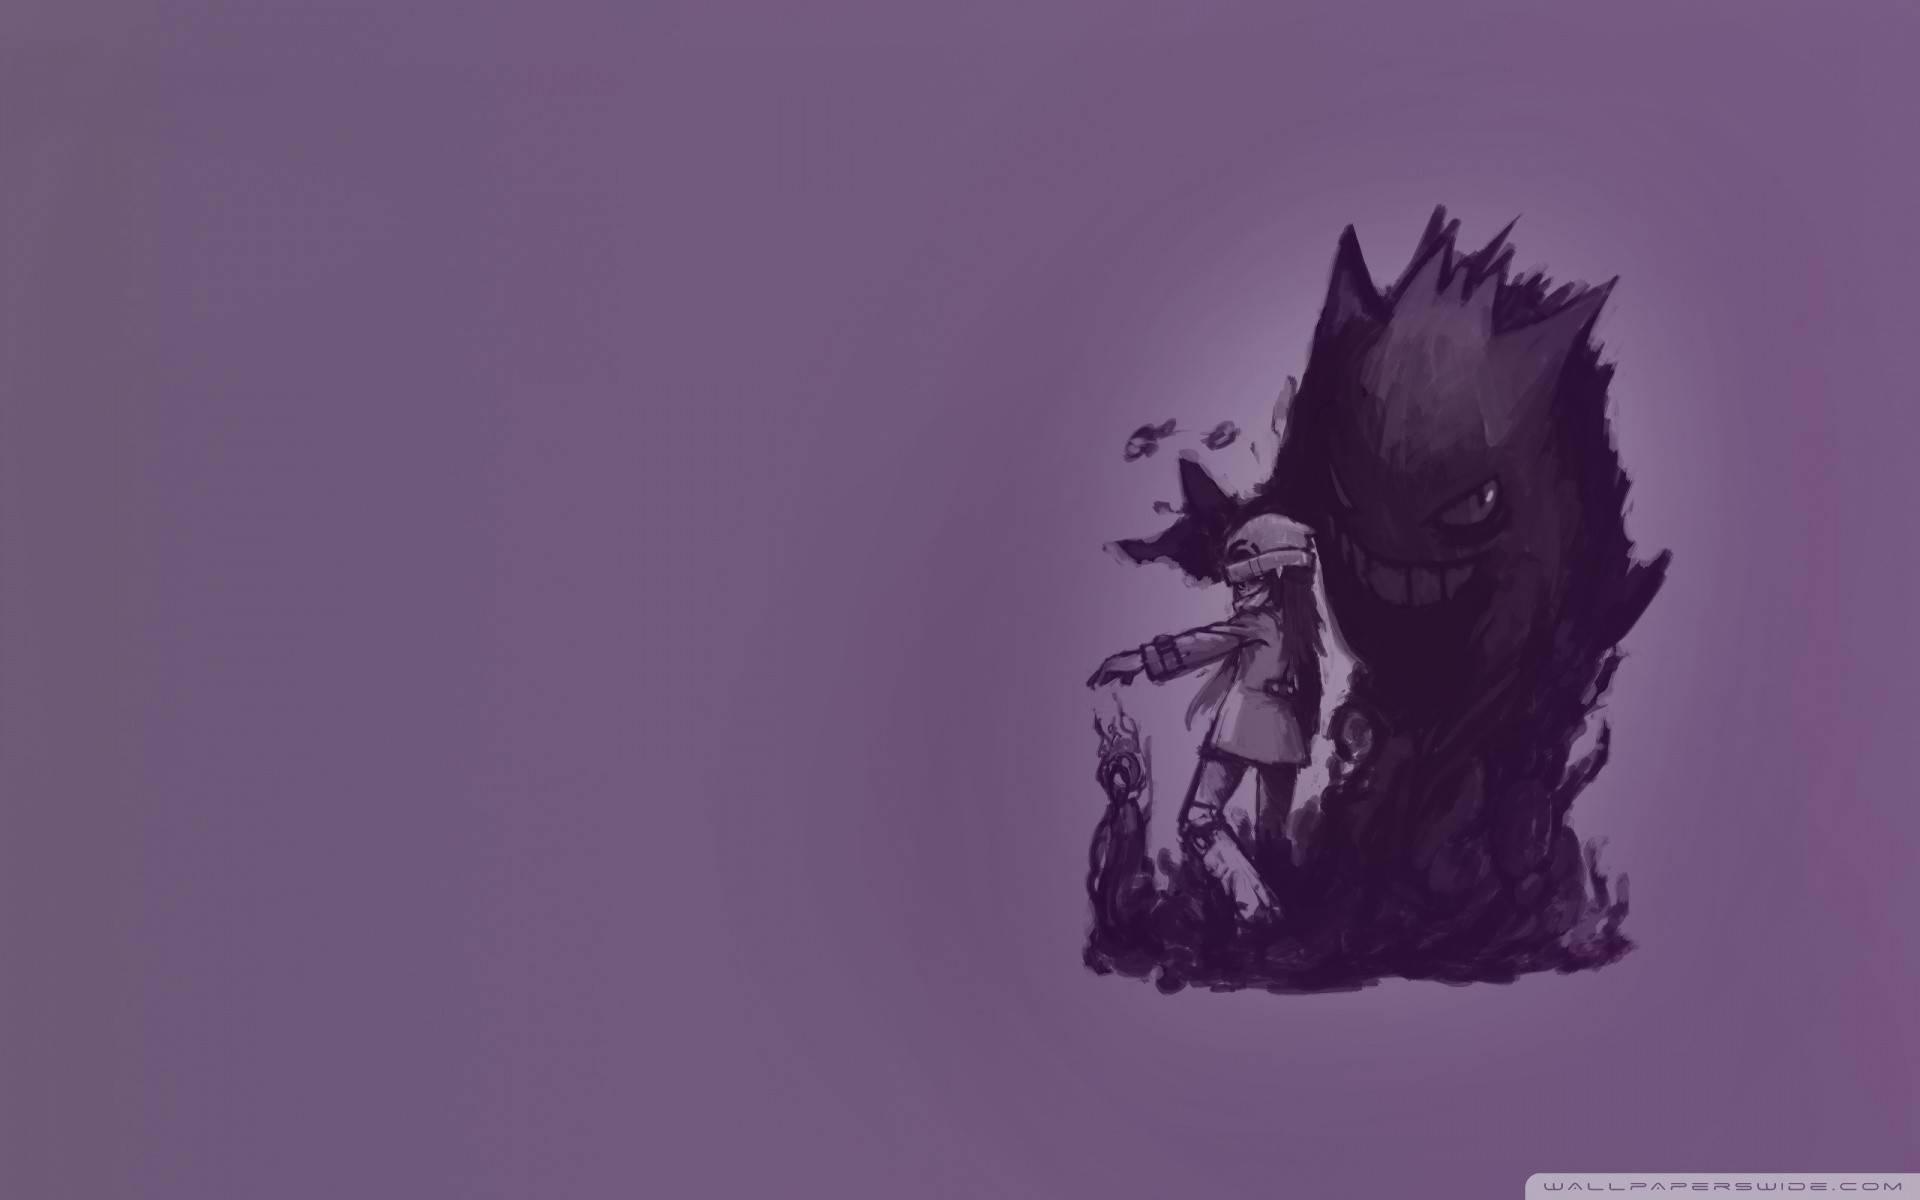 Dark Shadows 19201200 Wallpaper 1696874 1920x1200